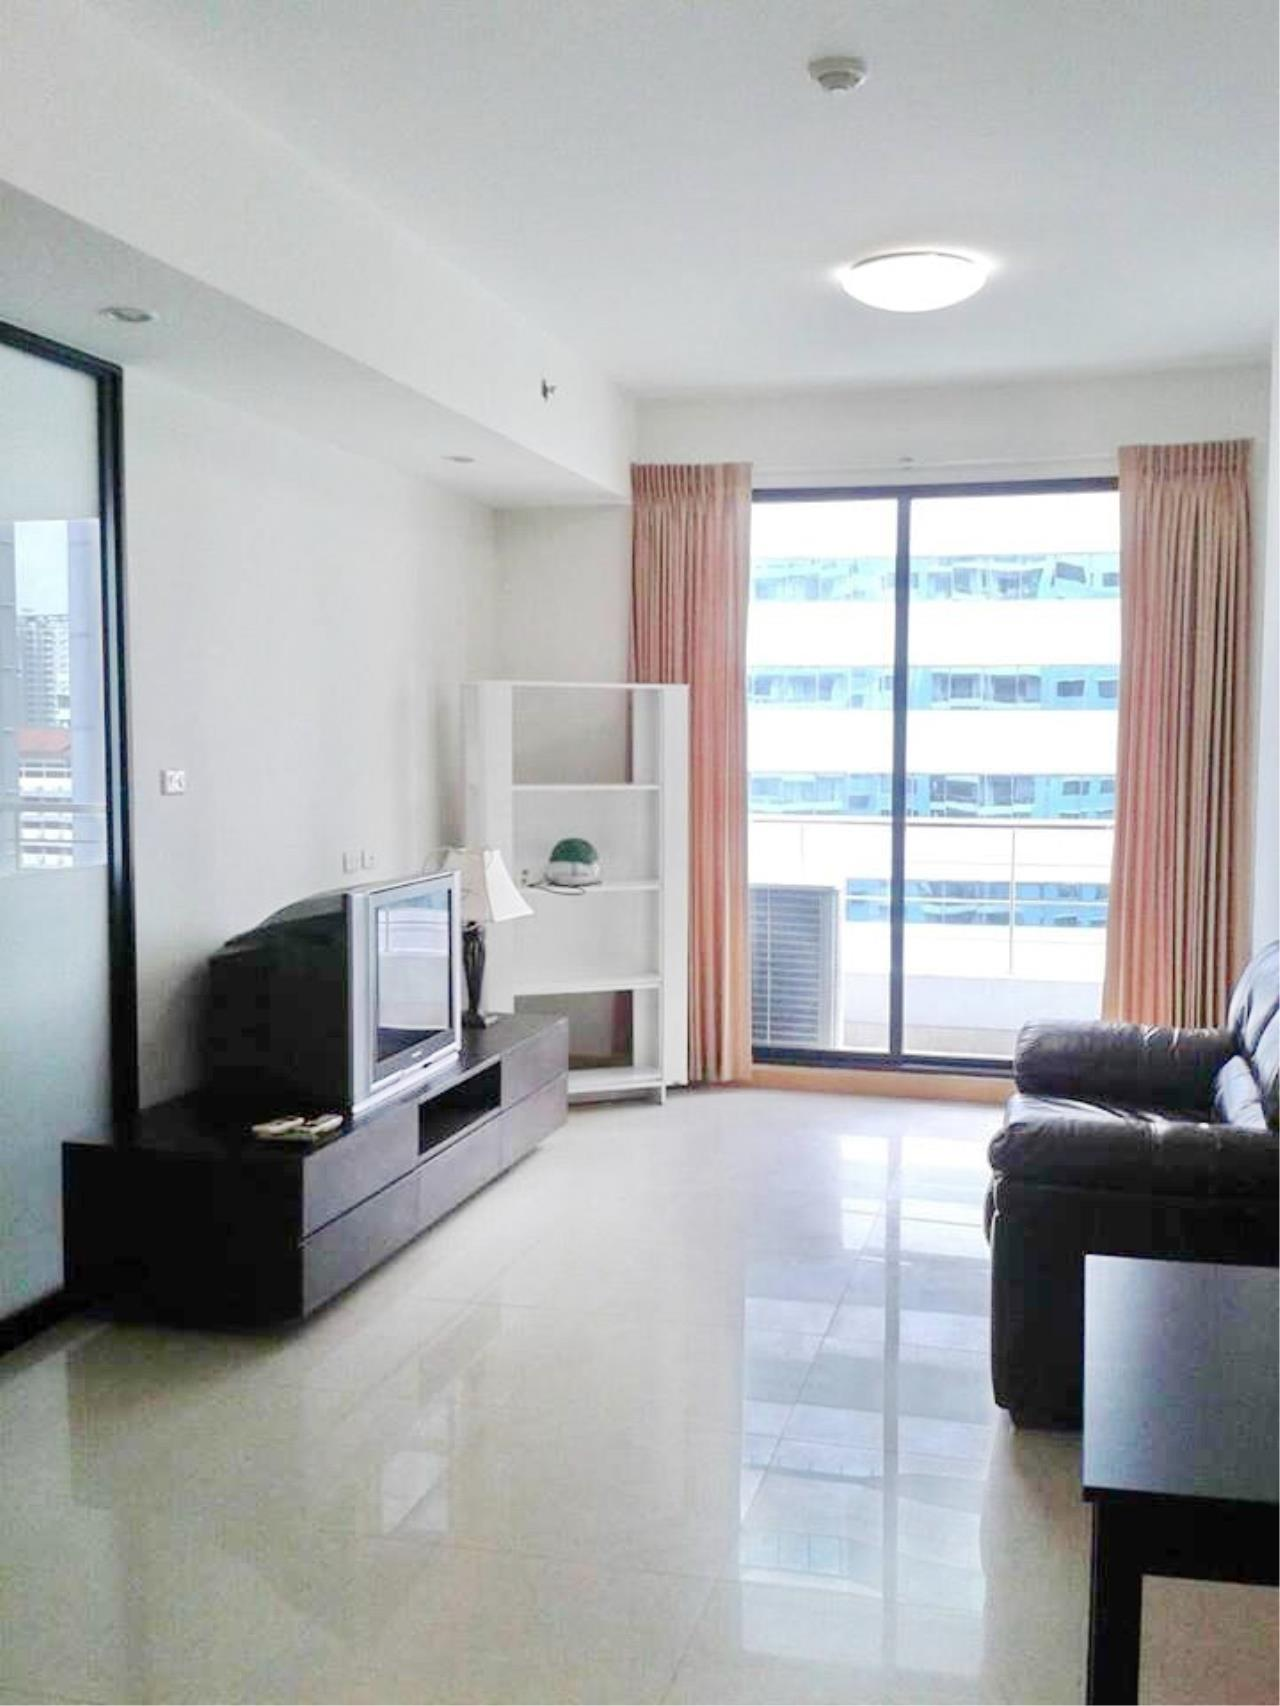 Agent - Mayteekul Sujirapinyokul Agency's AC5180418 For Rent Condo Supalai Premier Place Asoke Condo MRT Phetchaburi 7